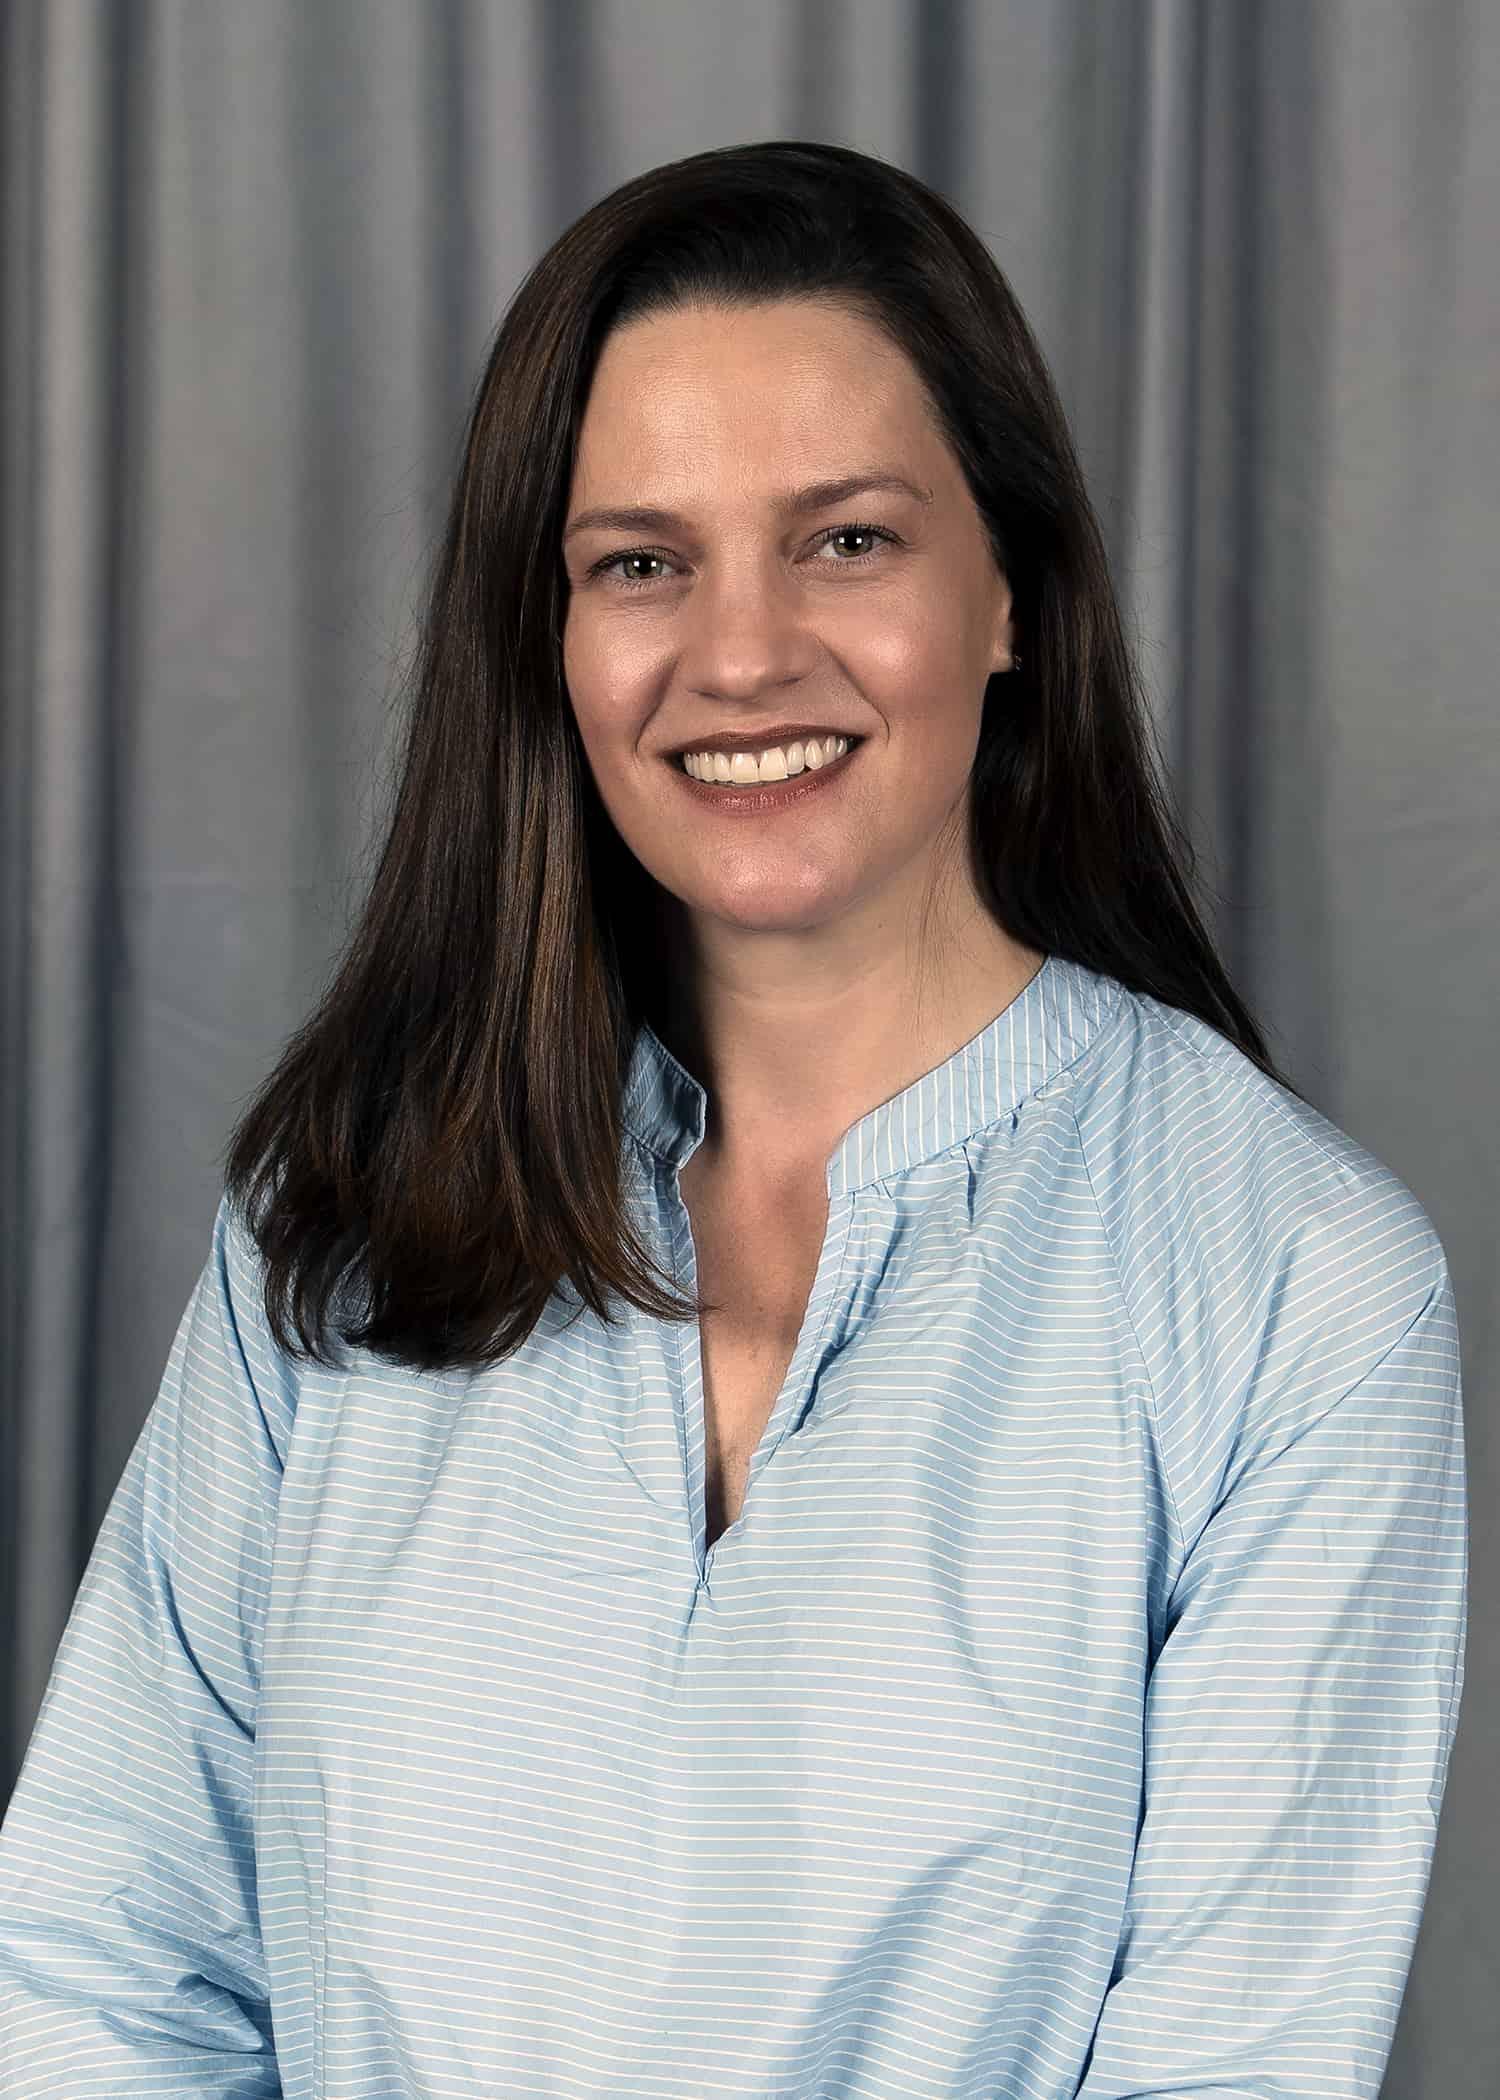 Karen Ragland